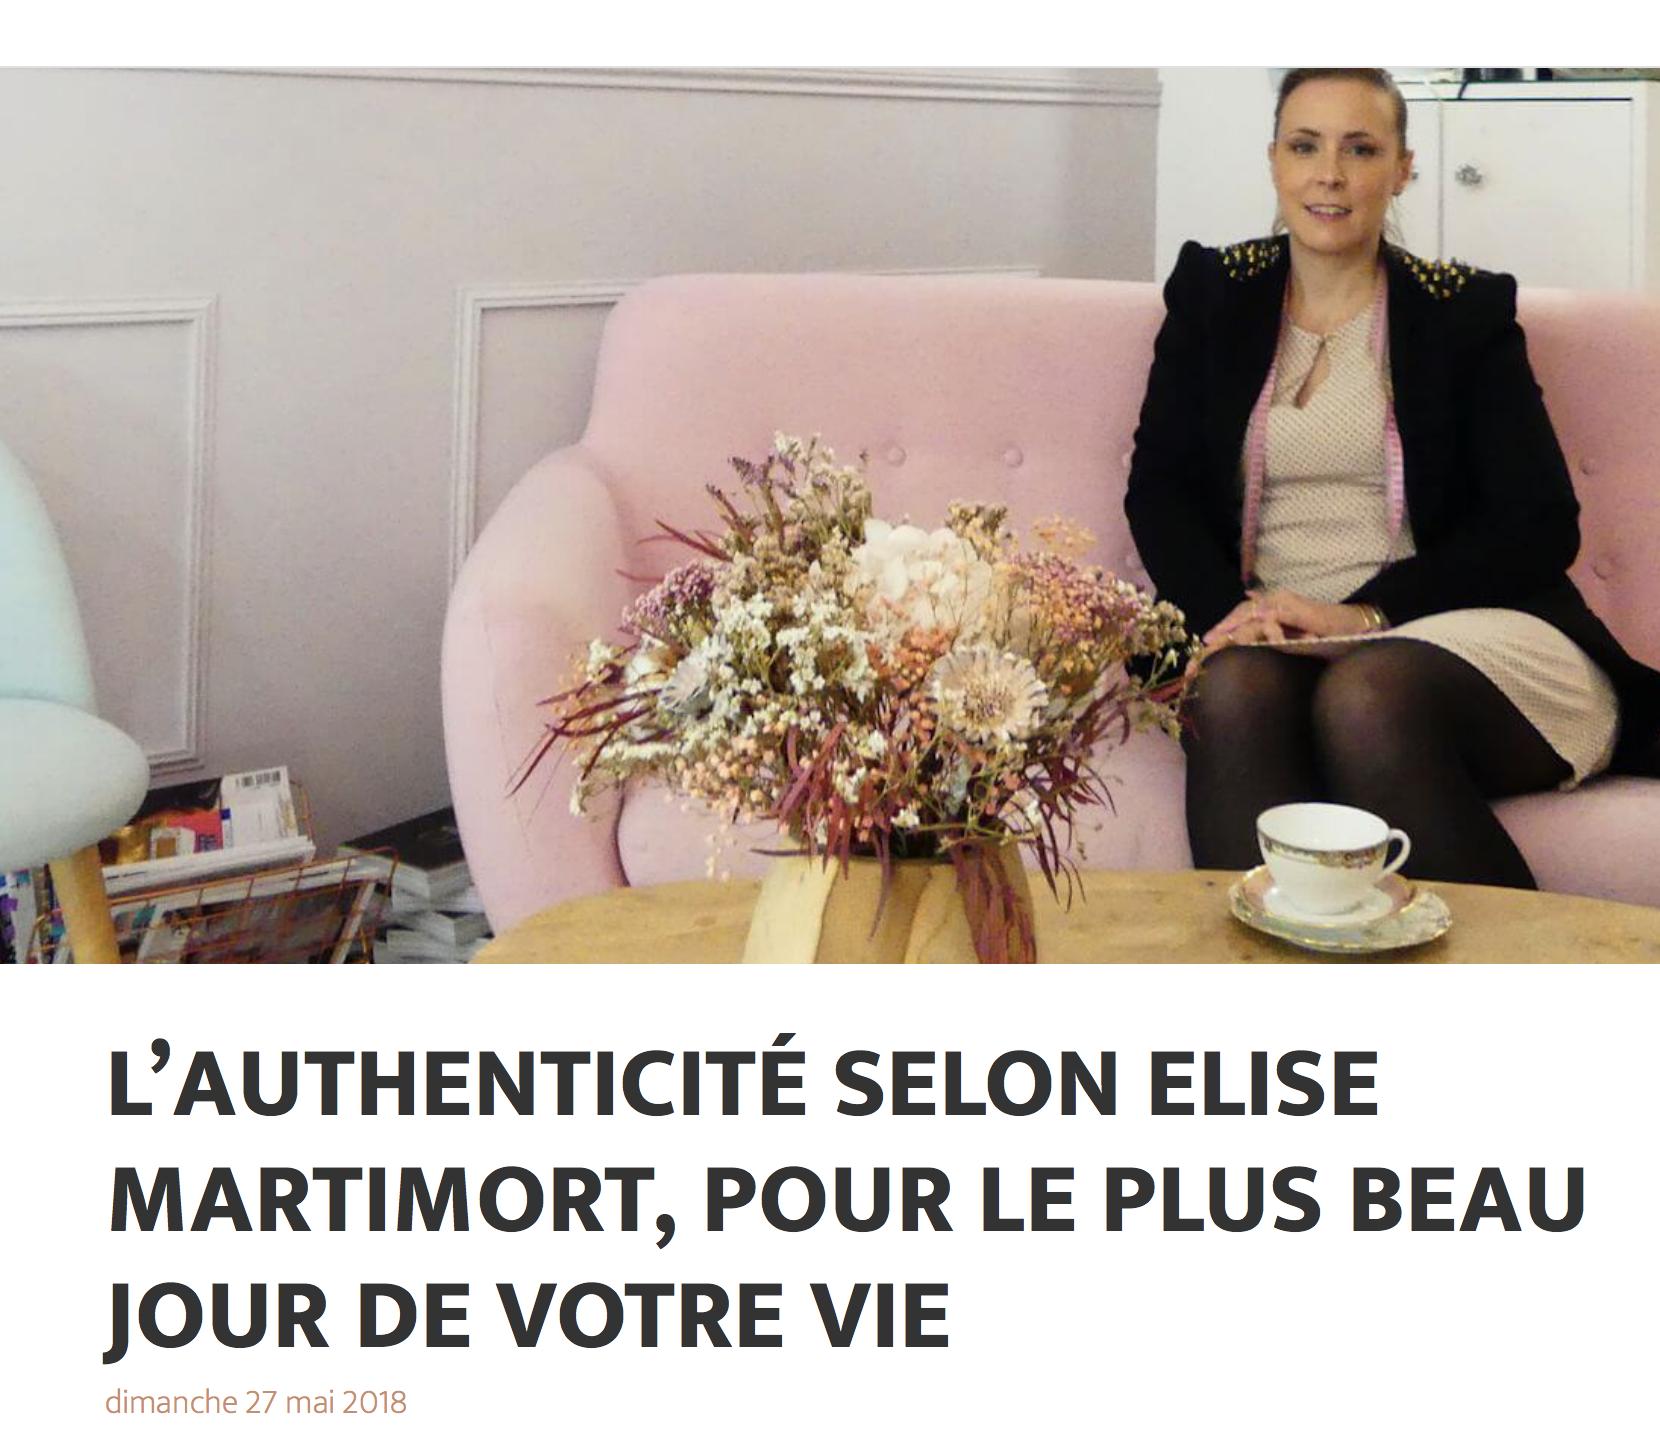 The Authentic Luxury Elise Martimort Robe de Mariée Luxe